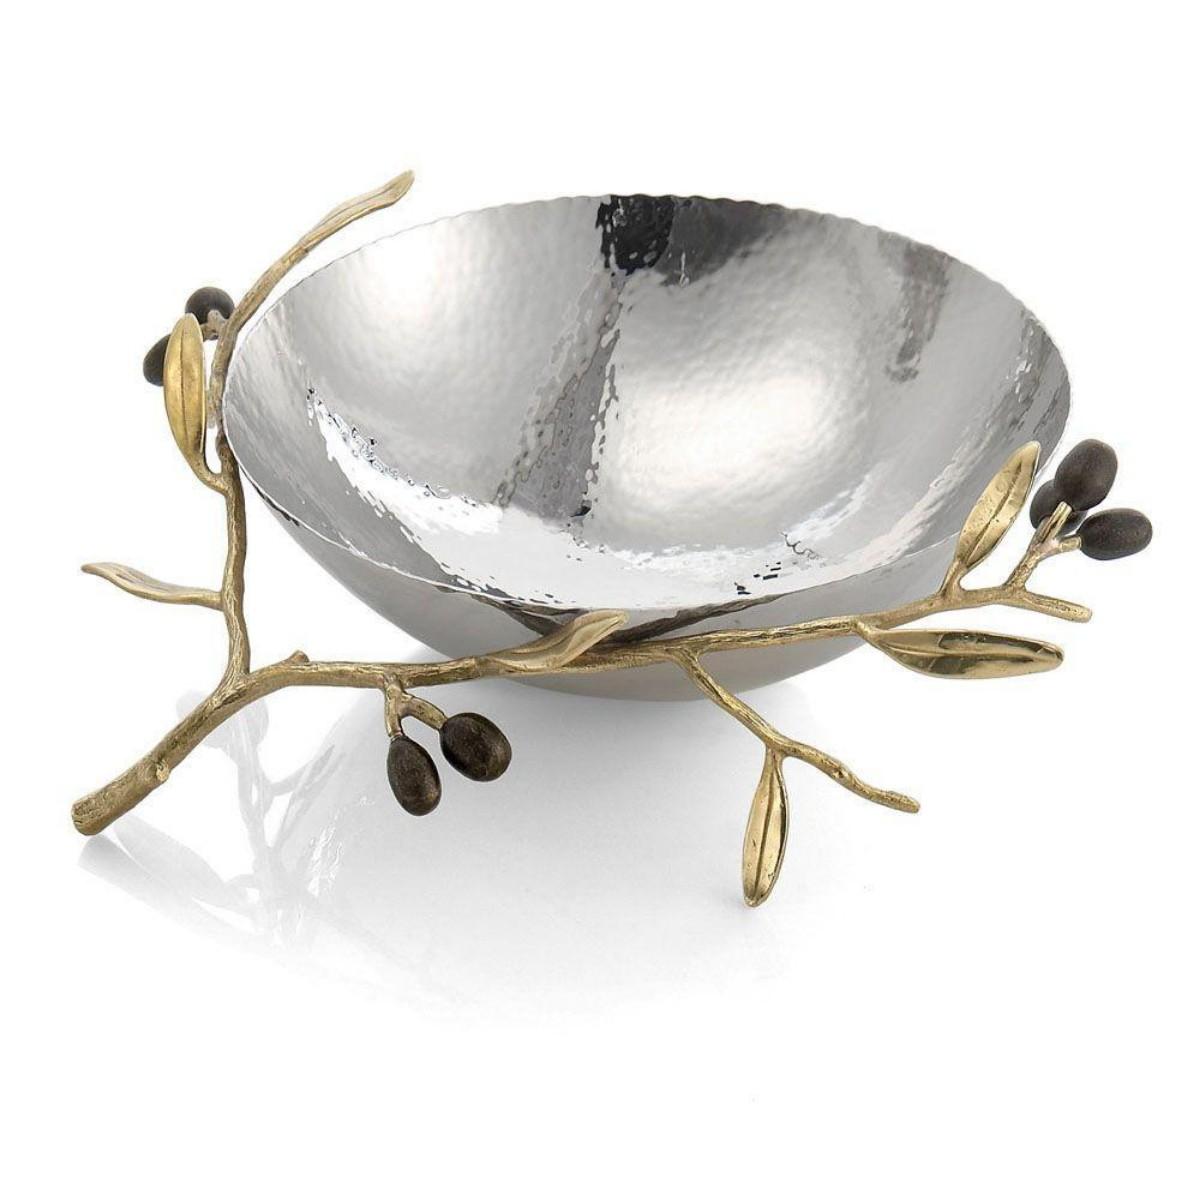 Michael Aram I Olive Branch Gold Steel Bowl